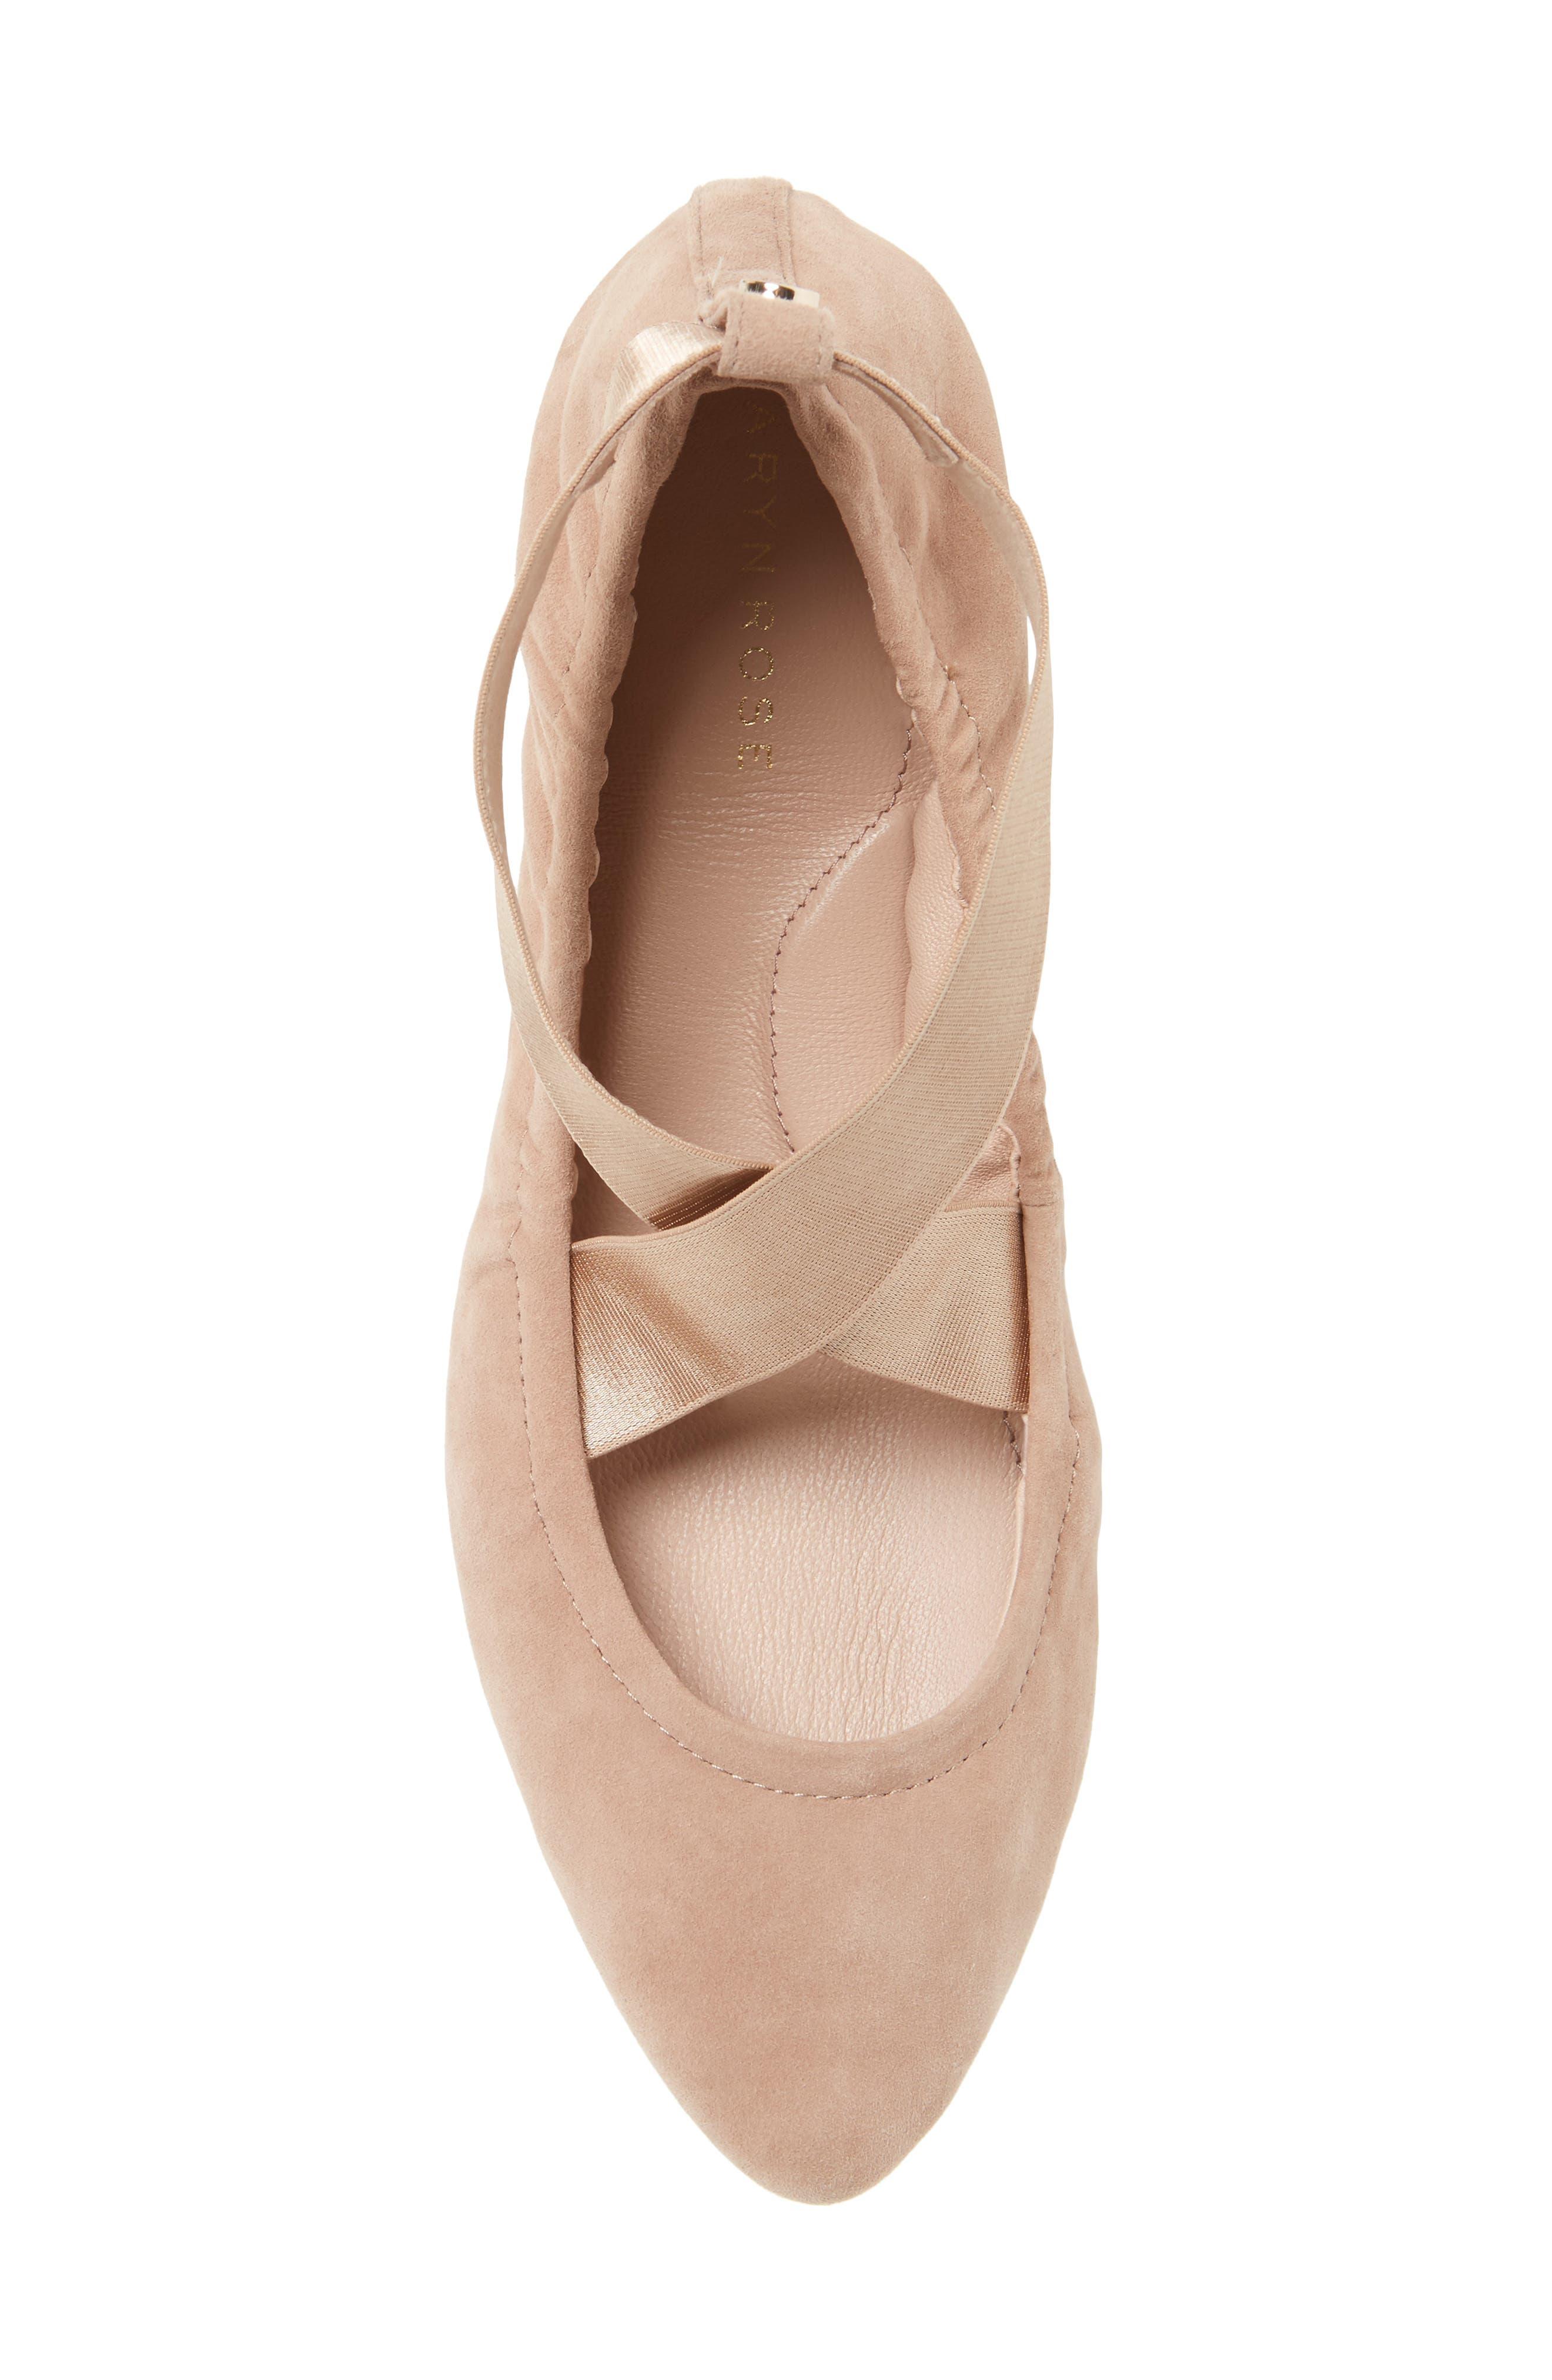 Edina Strappy Ballet Flat,                             Alternate thumbnail 22, color,